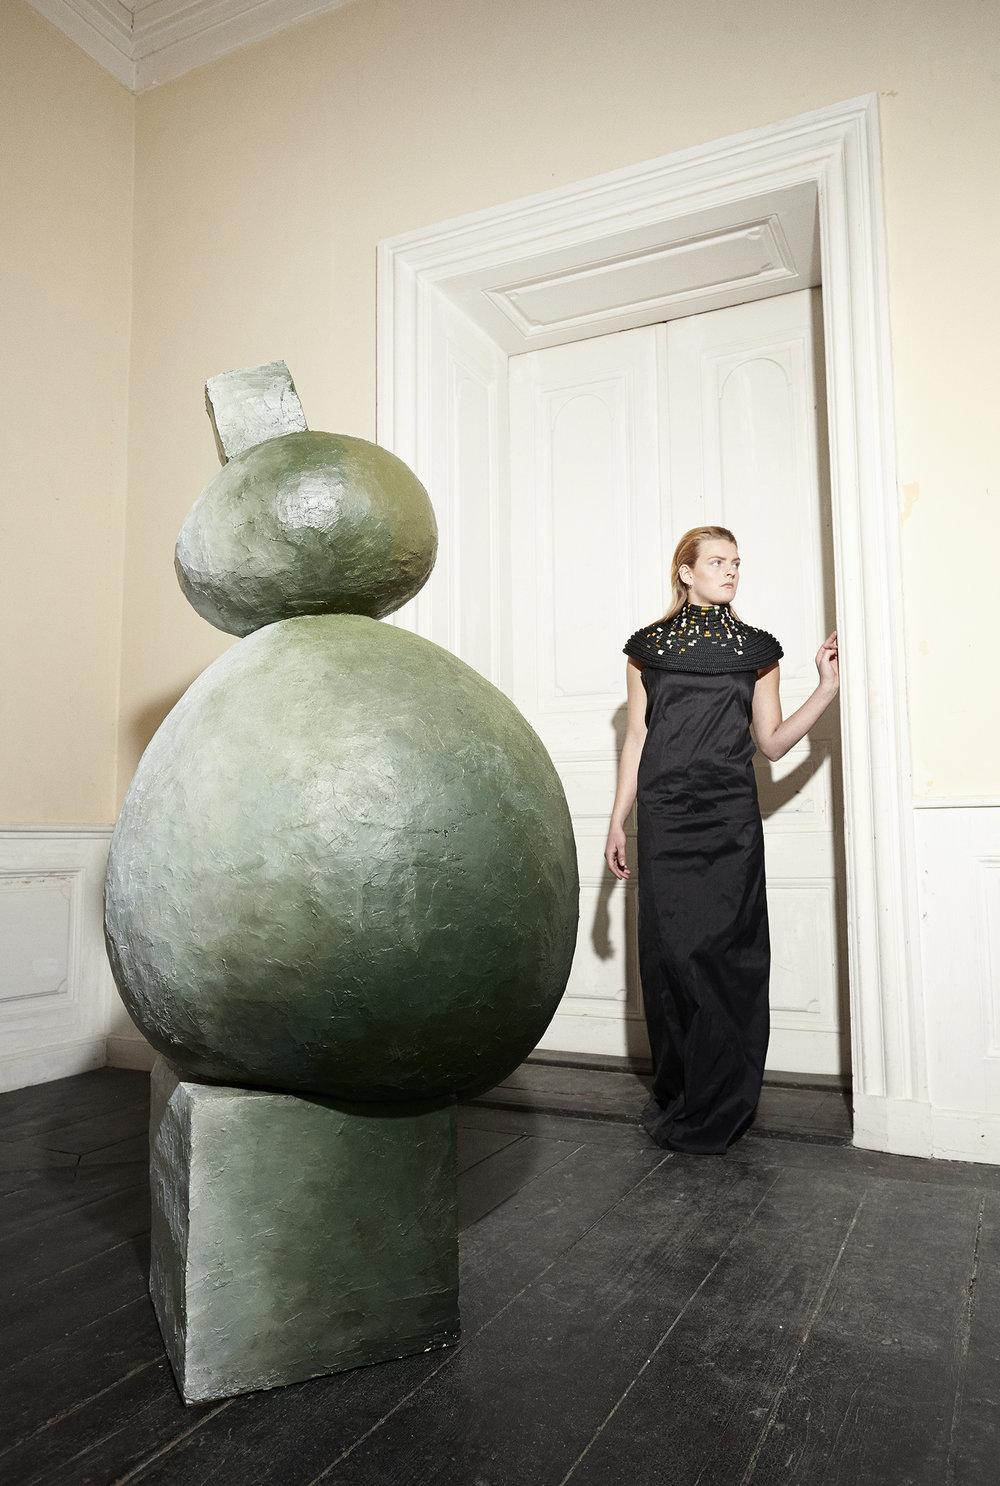 Fotos: Christiane Helsted Juul & Cornelia Gramkow.